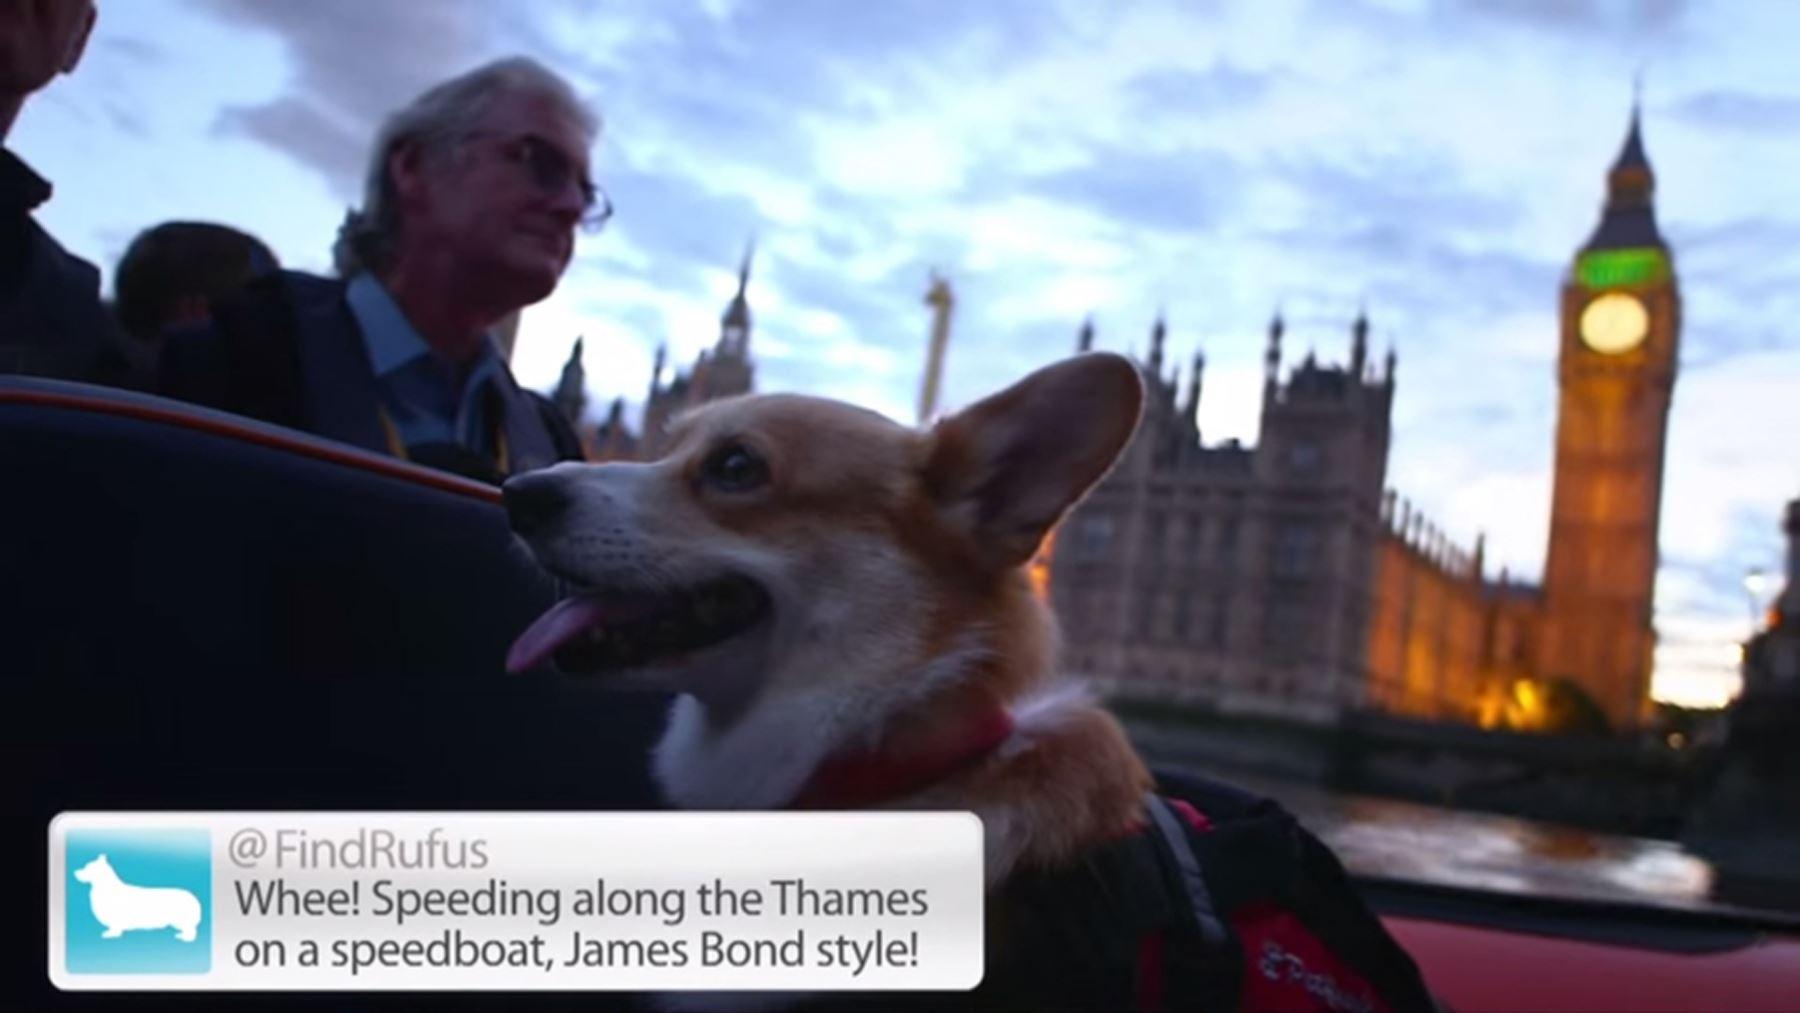 Dog Friendly London Experiences